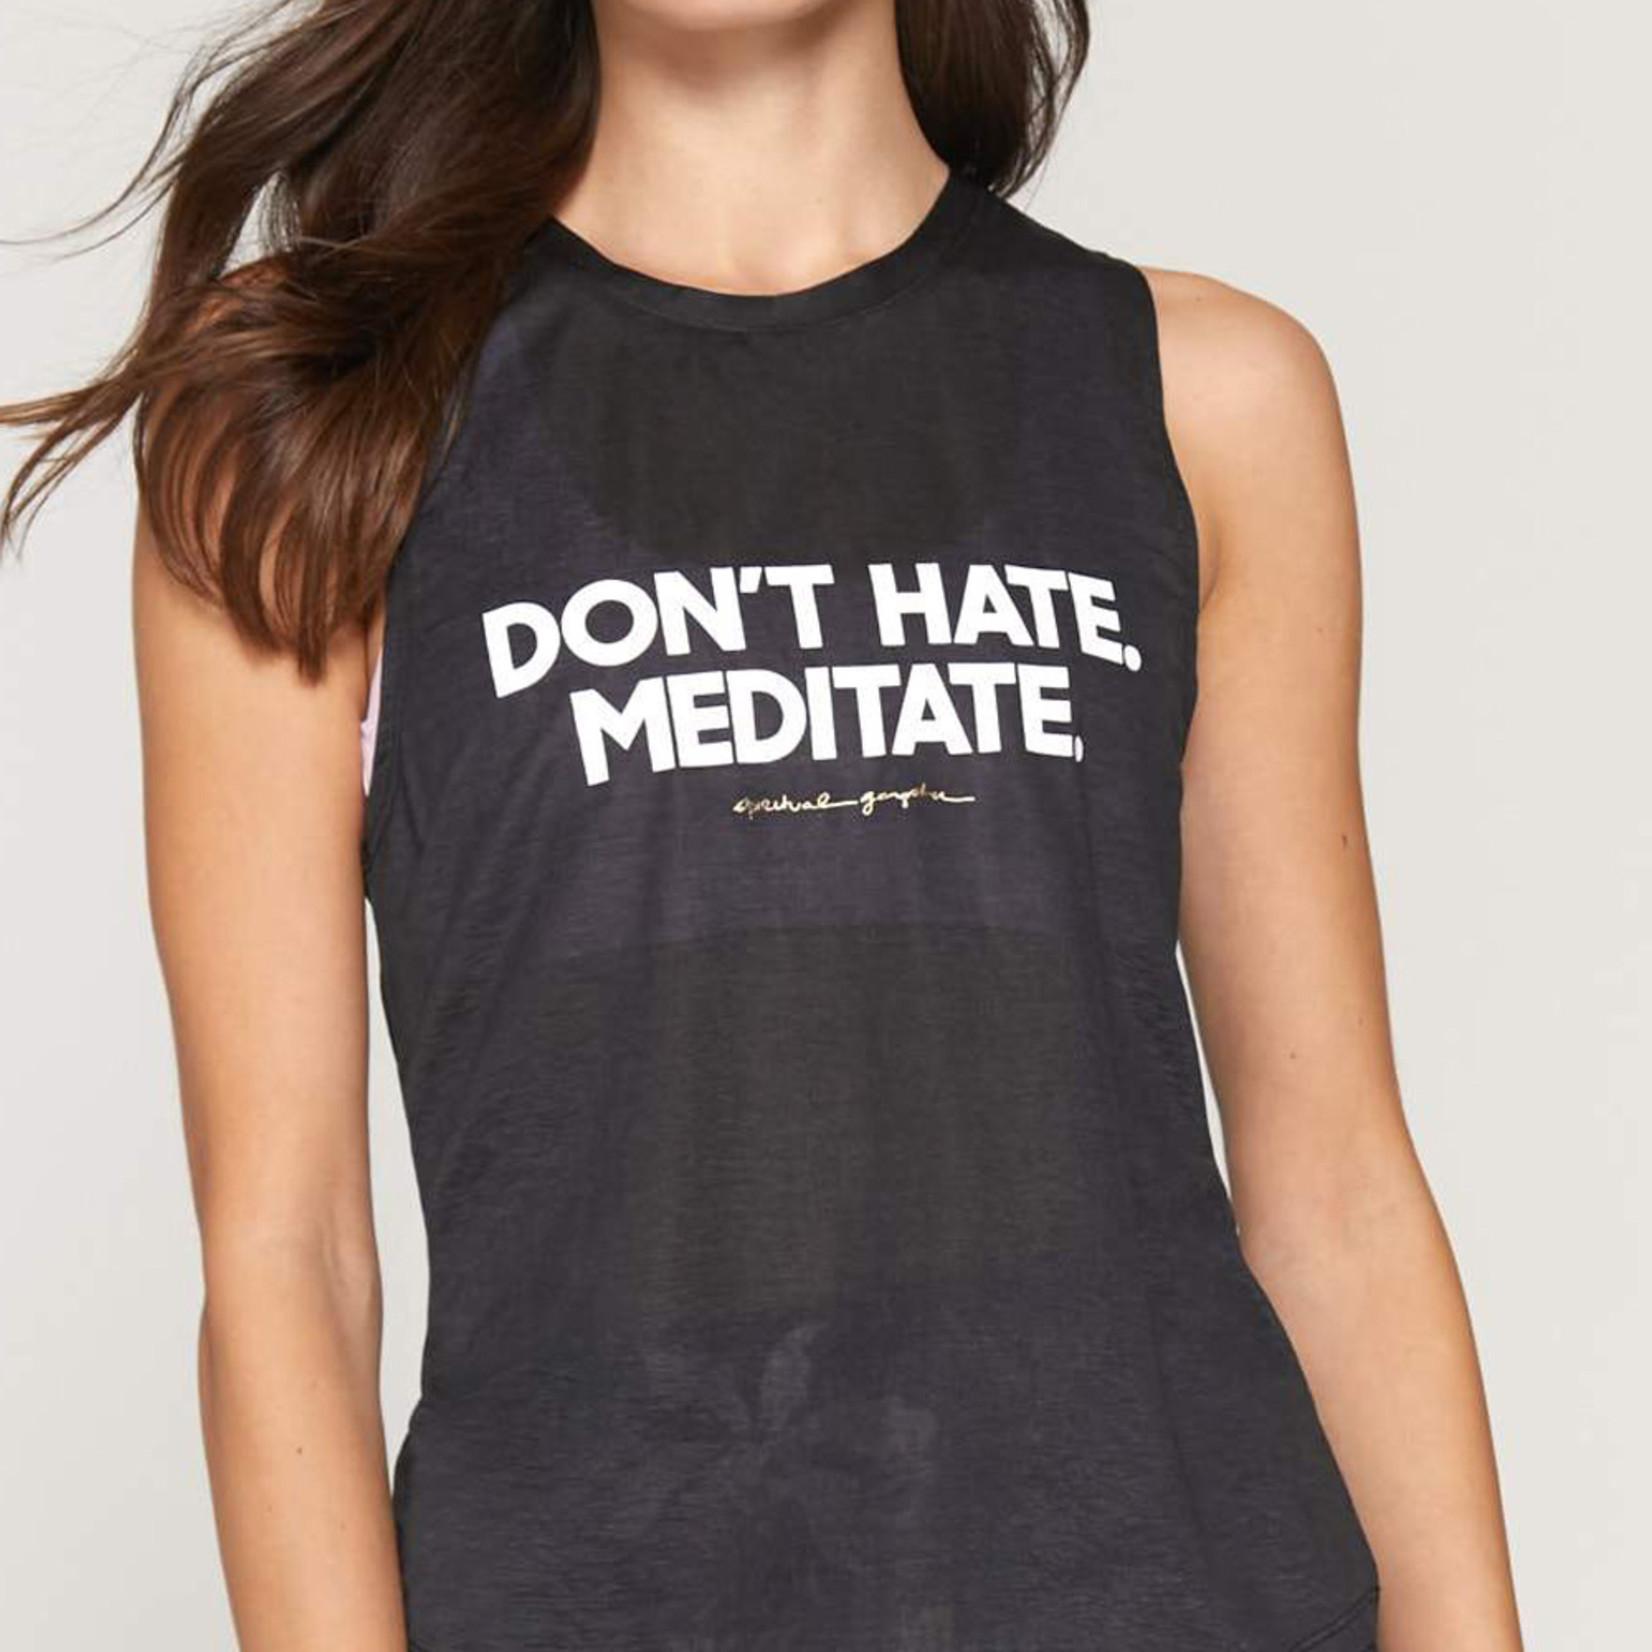 Spiritual Gangster Meditate Active Muscle Tank